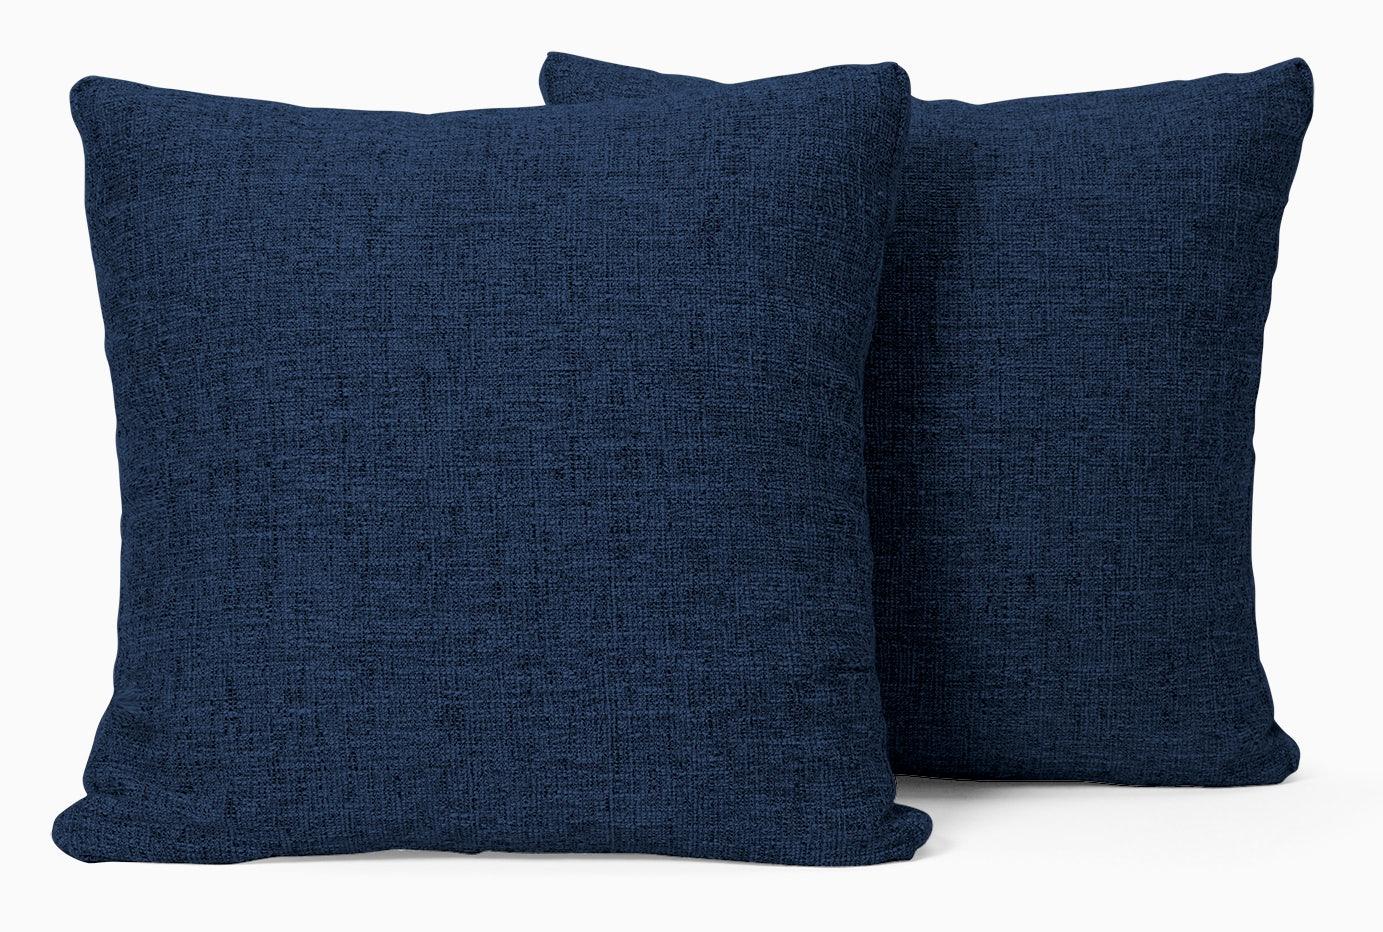 decorative boxed pillows %28set 2%29 key largo denim